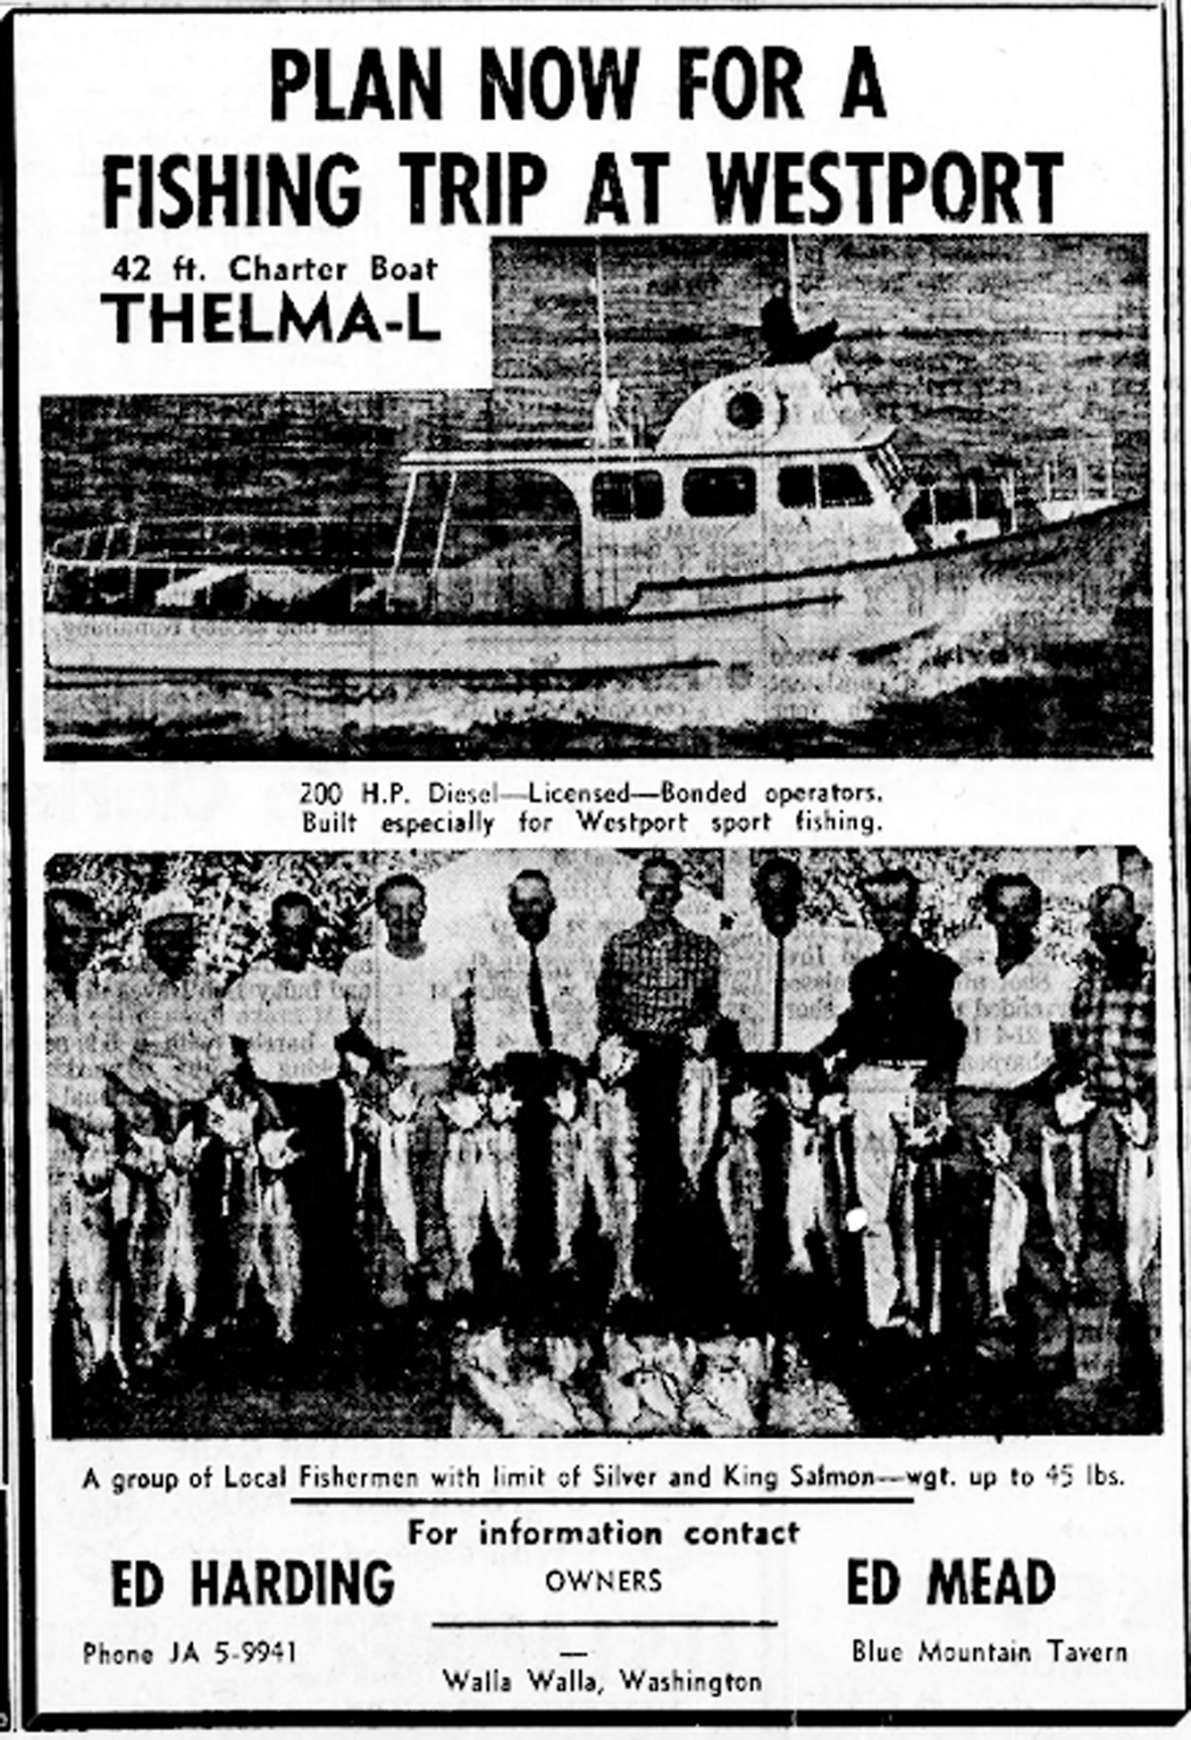 190811 Ed Harding's charter fishing boat Thelma L, Feb 24 1964.png